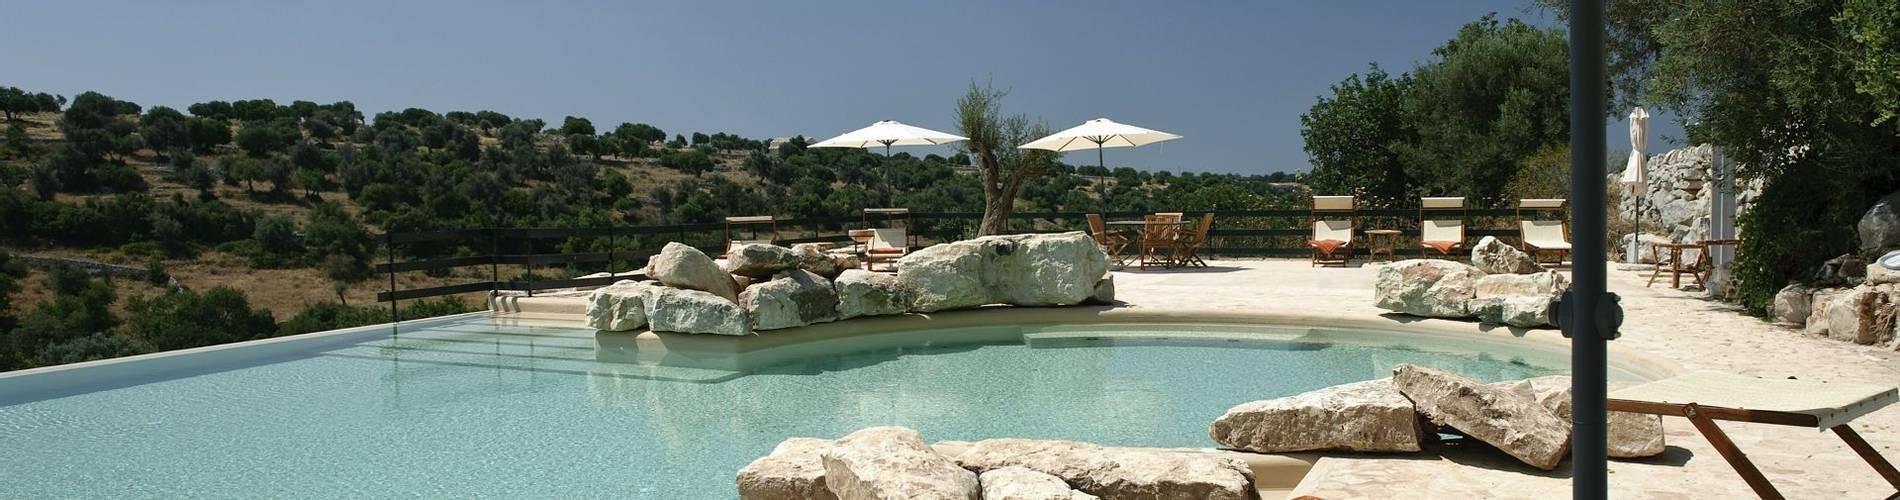 Parco Cavalonga, Sicily, Italy (14).jpg